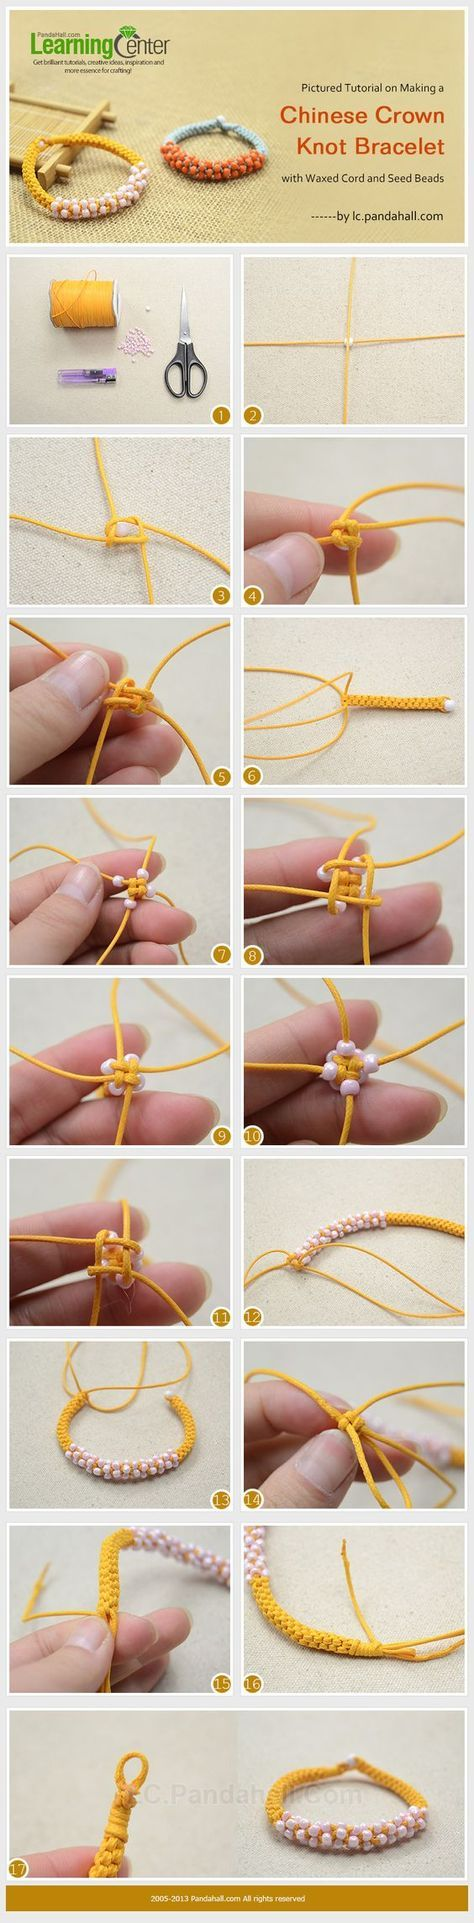 waxed cord bracelet instructions